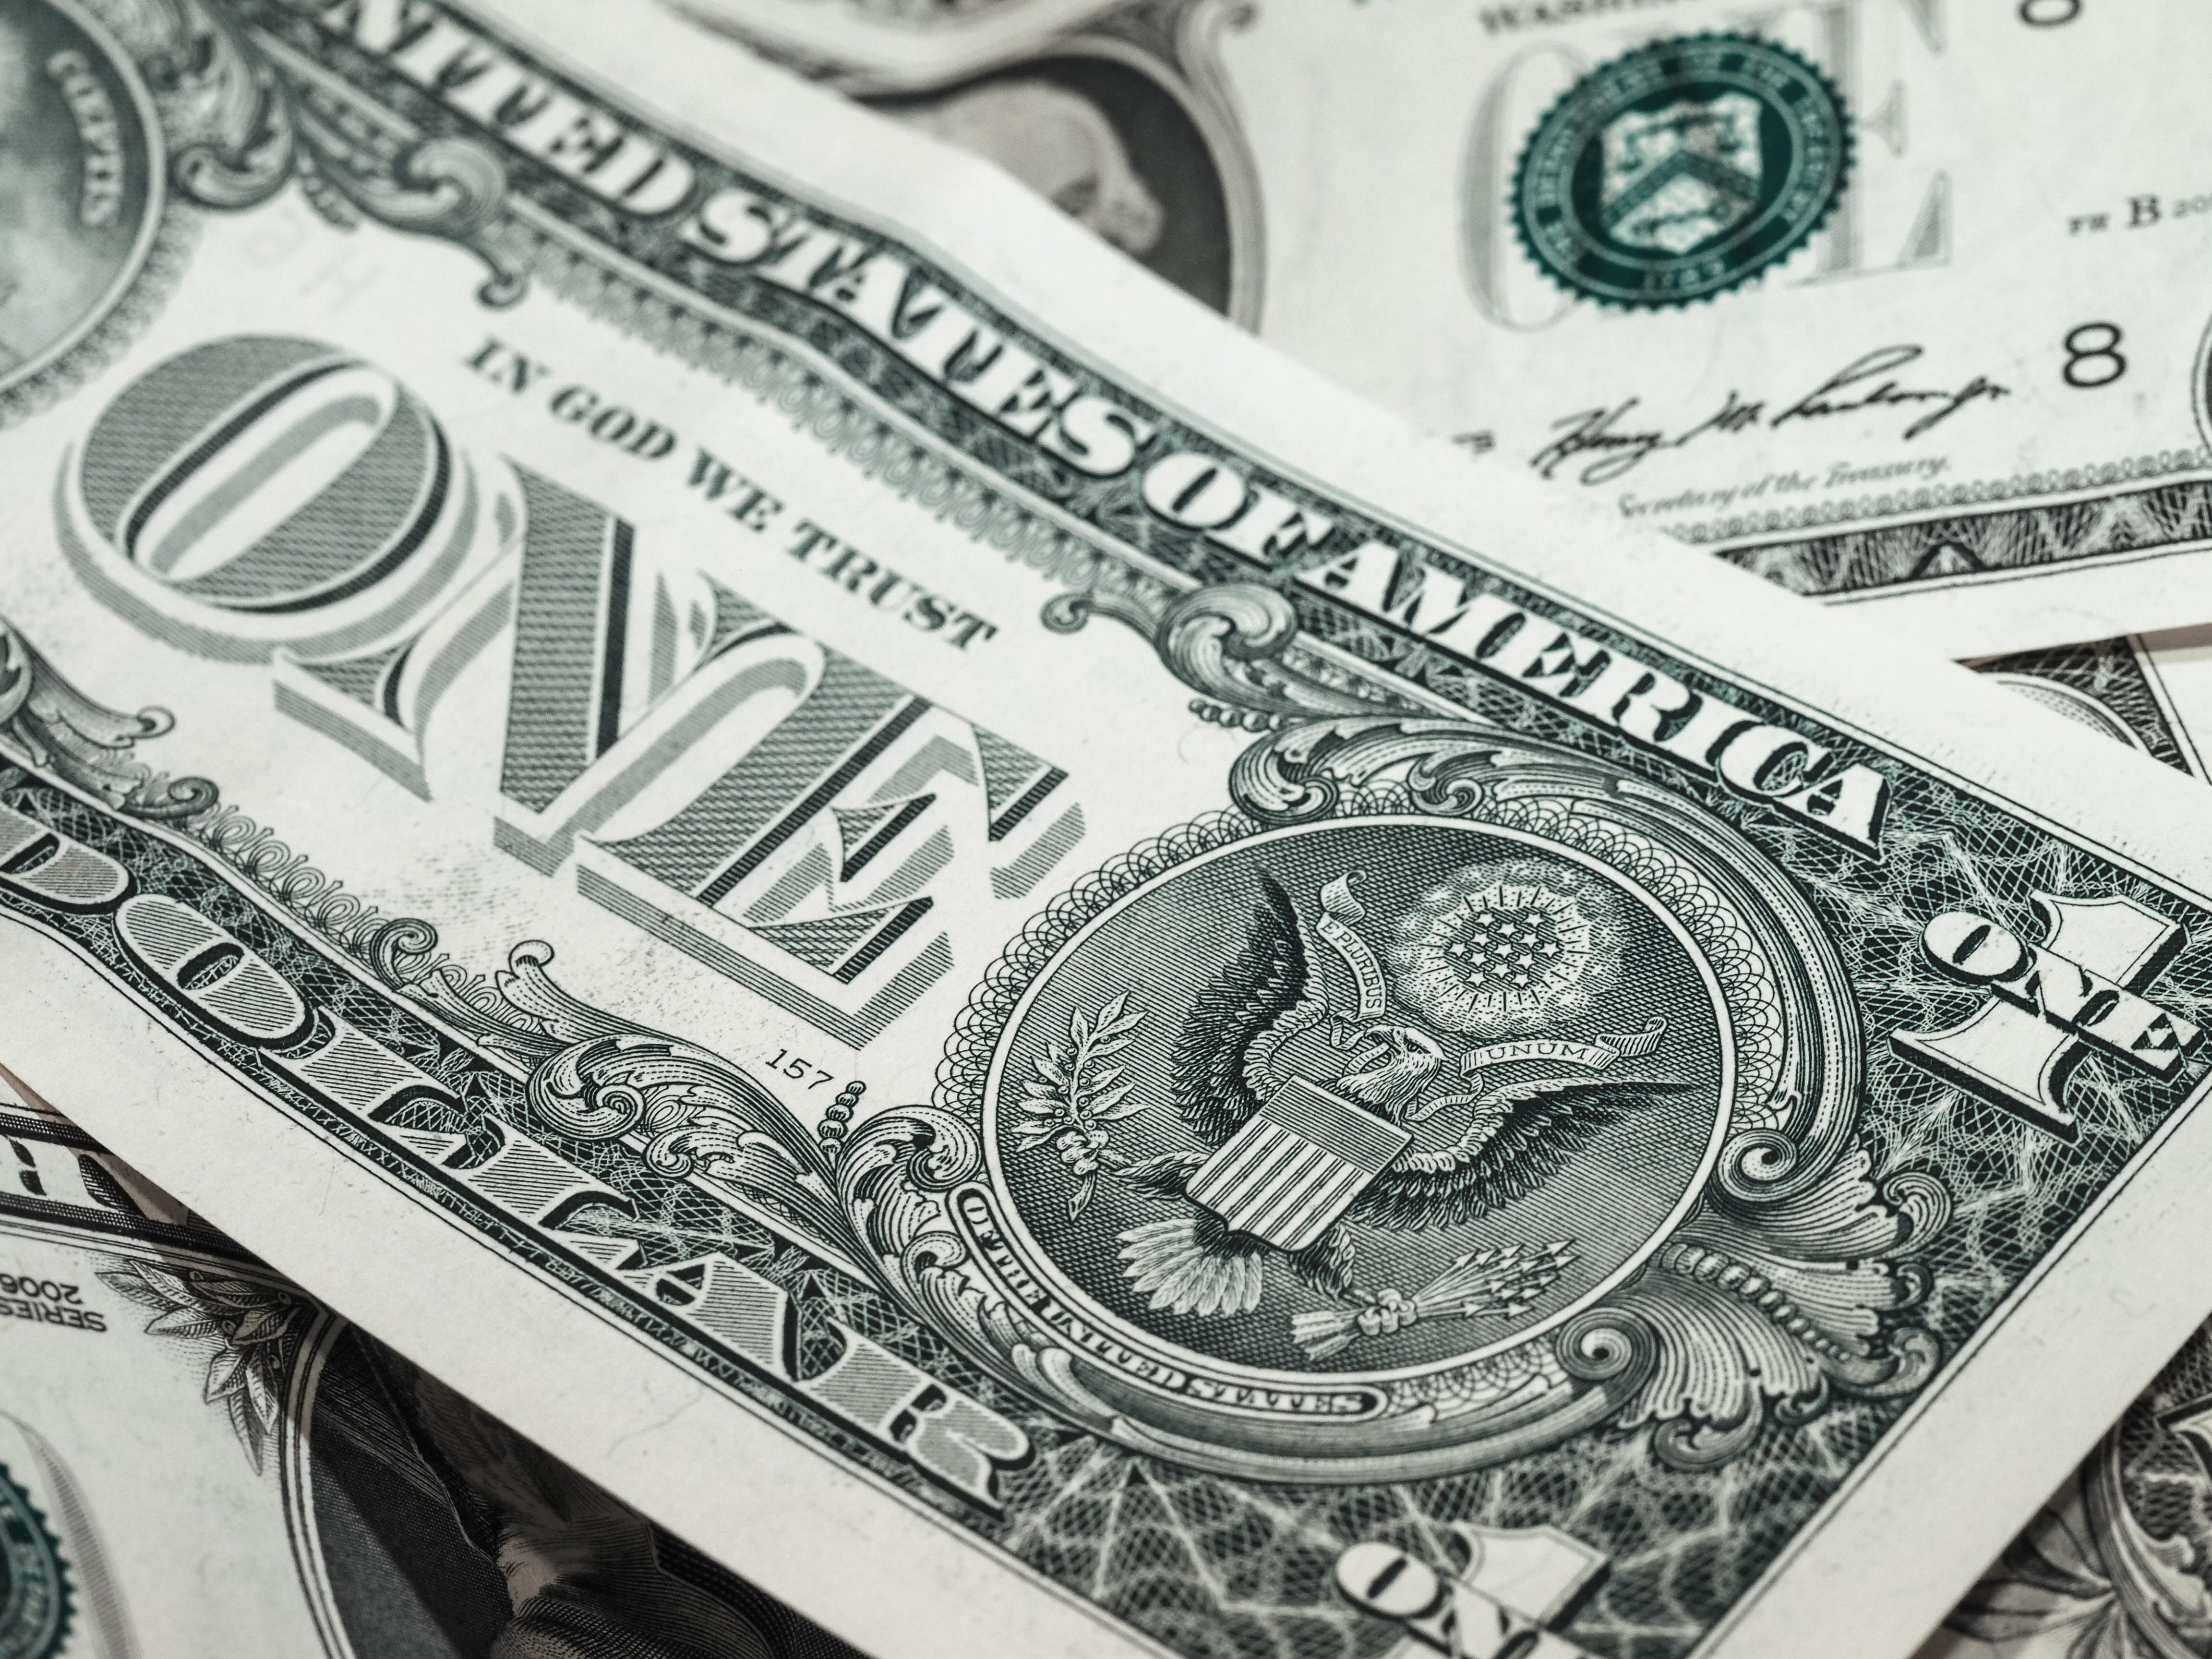 Gratis arkivbilde med betale, budsjett, formue, investering